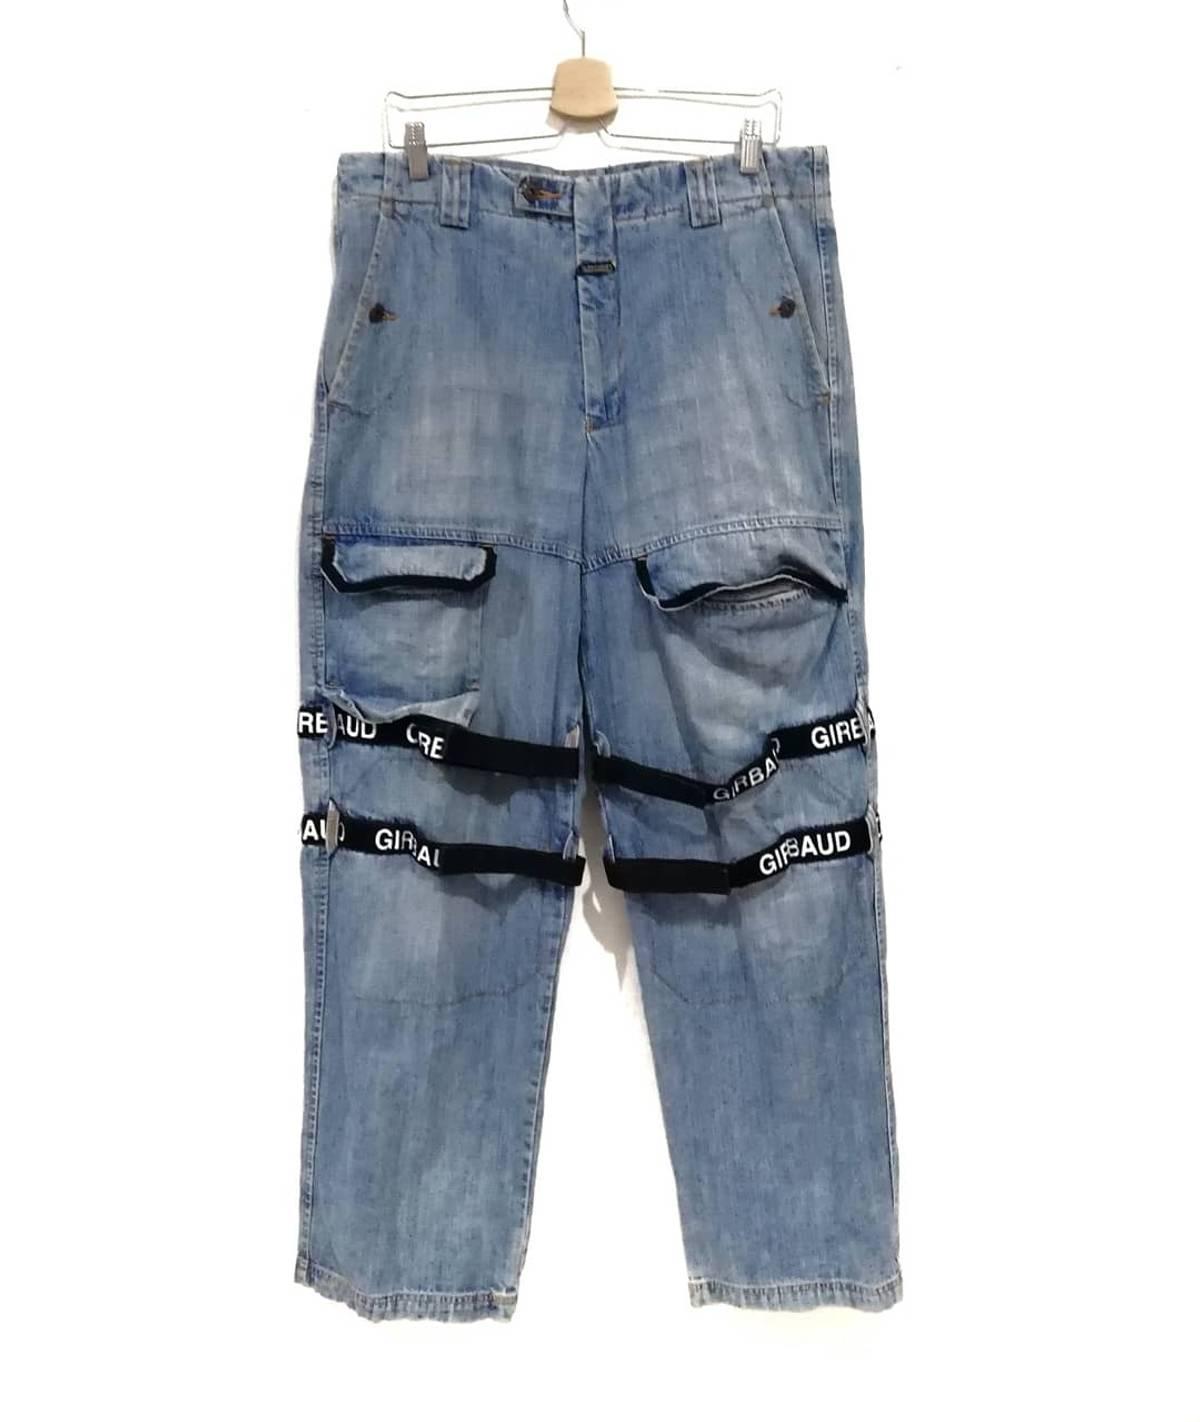 Vintage Vintage 90s Marithe Francois Girbaud Tapered Jeans Beige Grailed